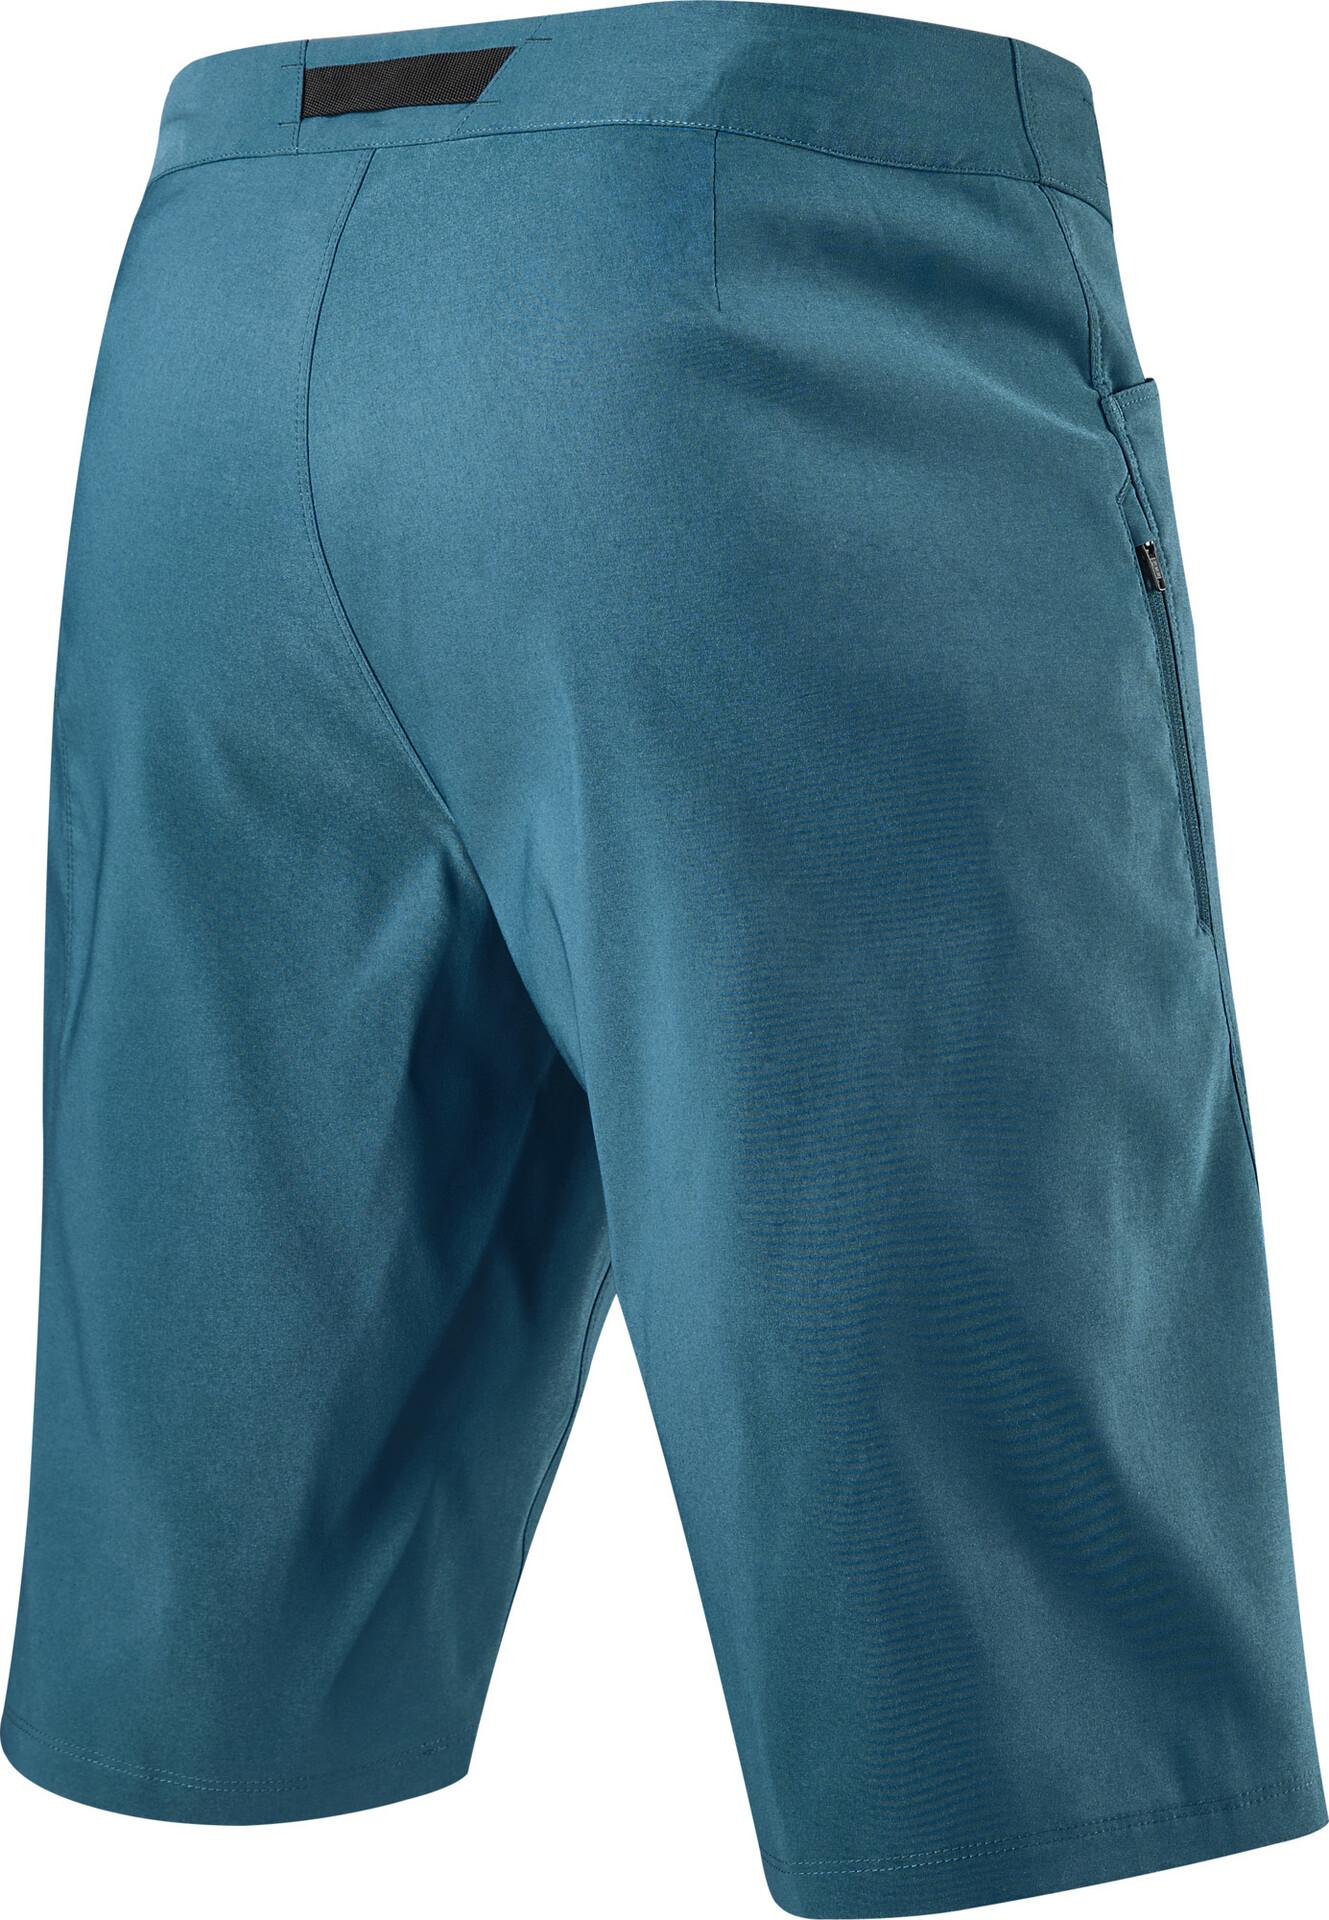 Mavi Cargo Shorts Pantaloncini Uomo